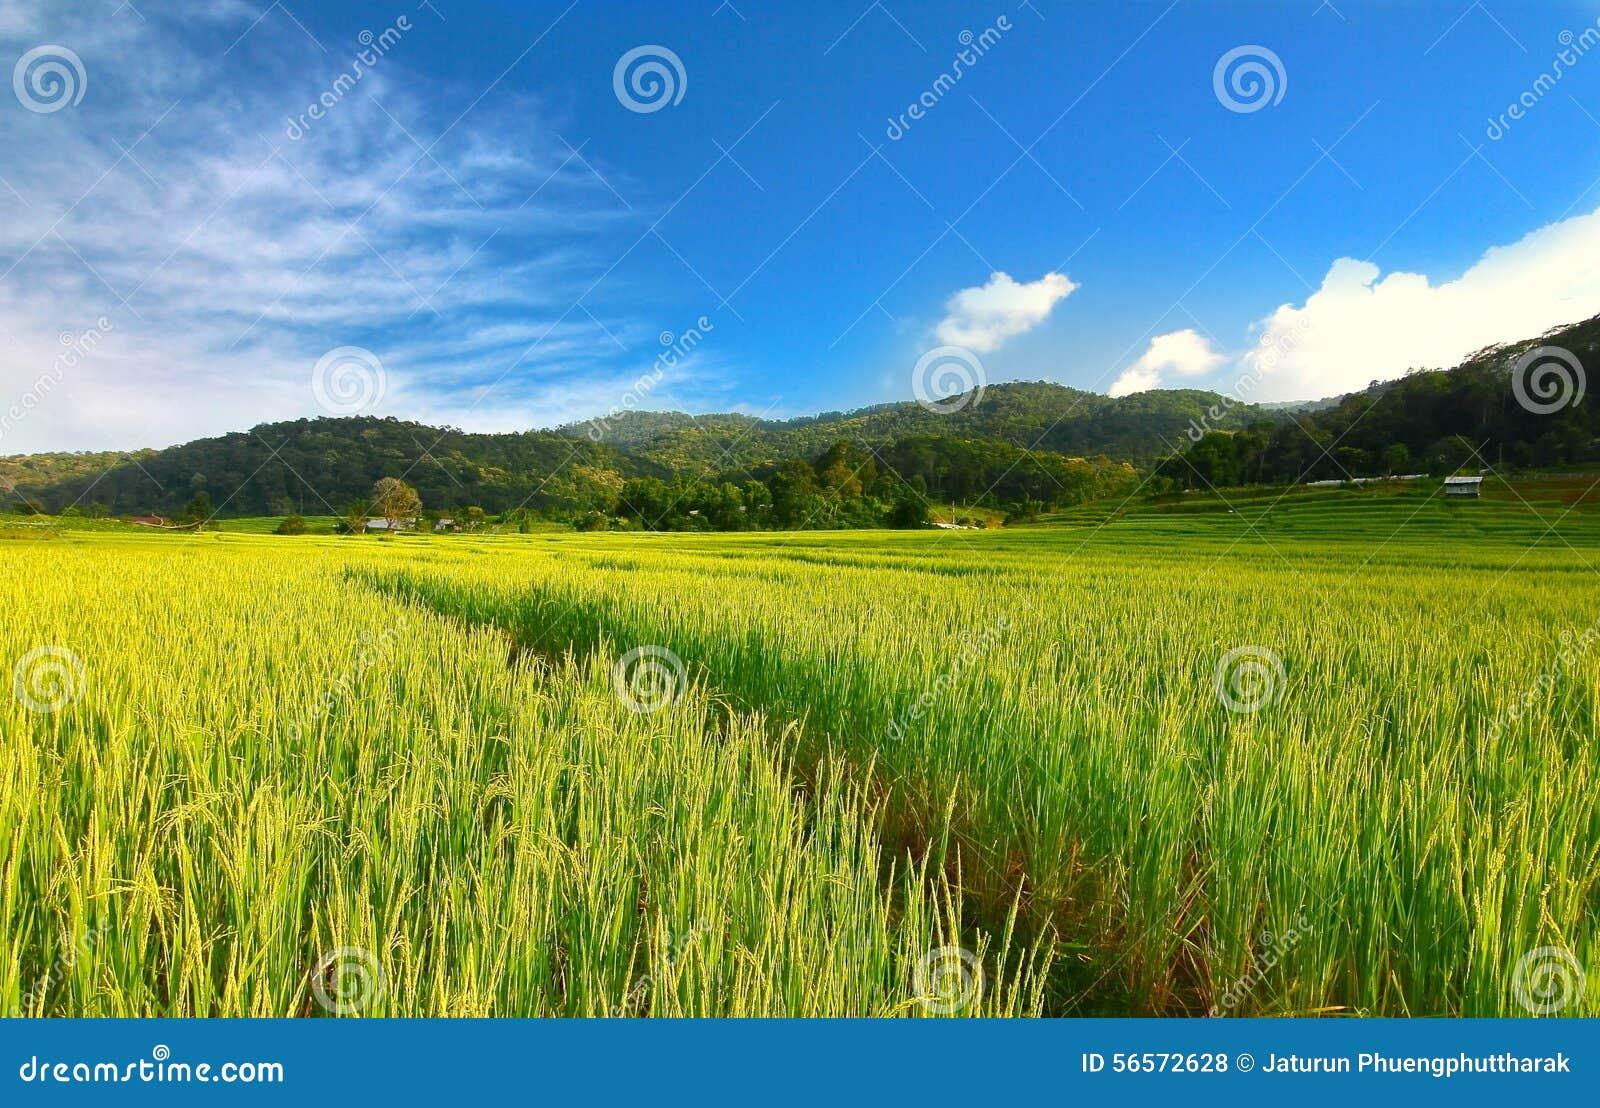 Download Terraced τομέας ρυζιού σε Chiangmai, Ταϊλάνδη Στοκ Εικόνες - εικόνα από αρχιτεκτονικής, λόφος: 56572628